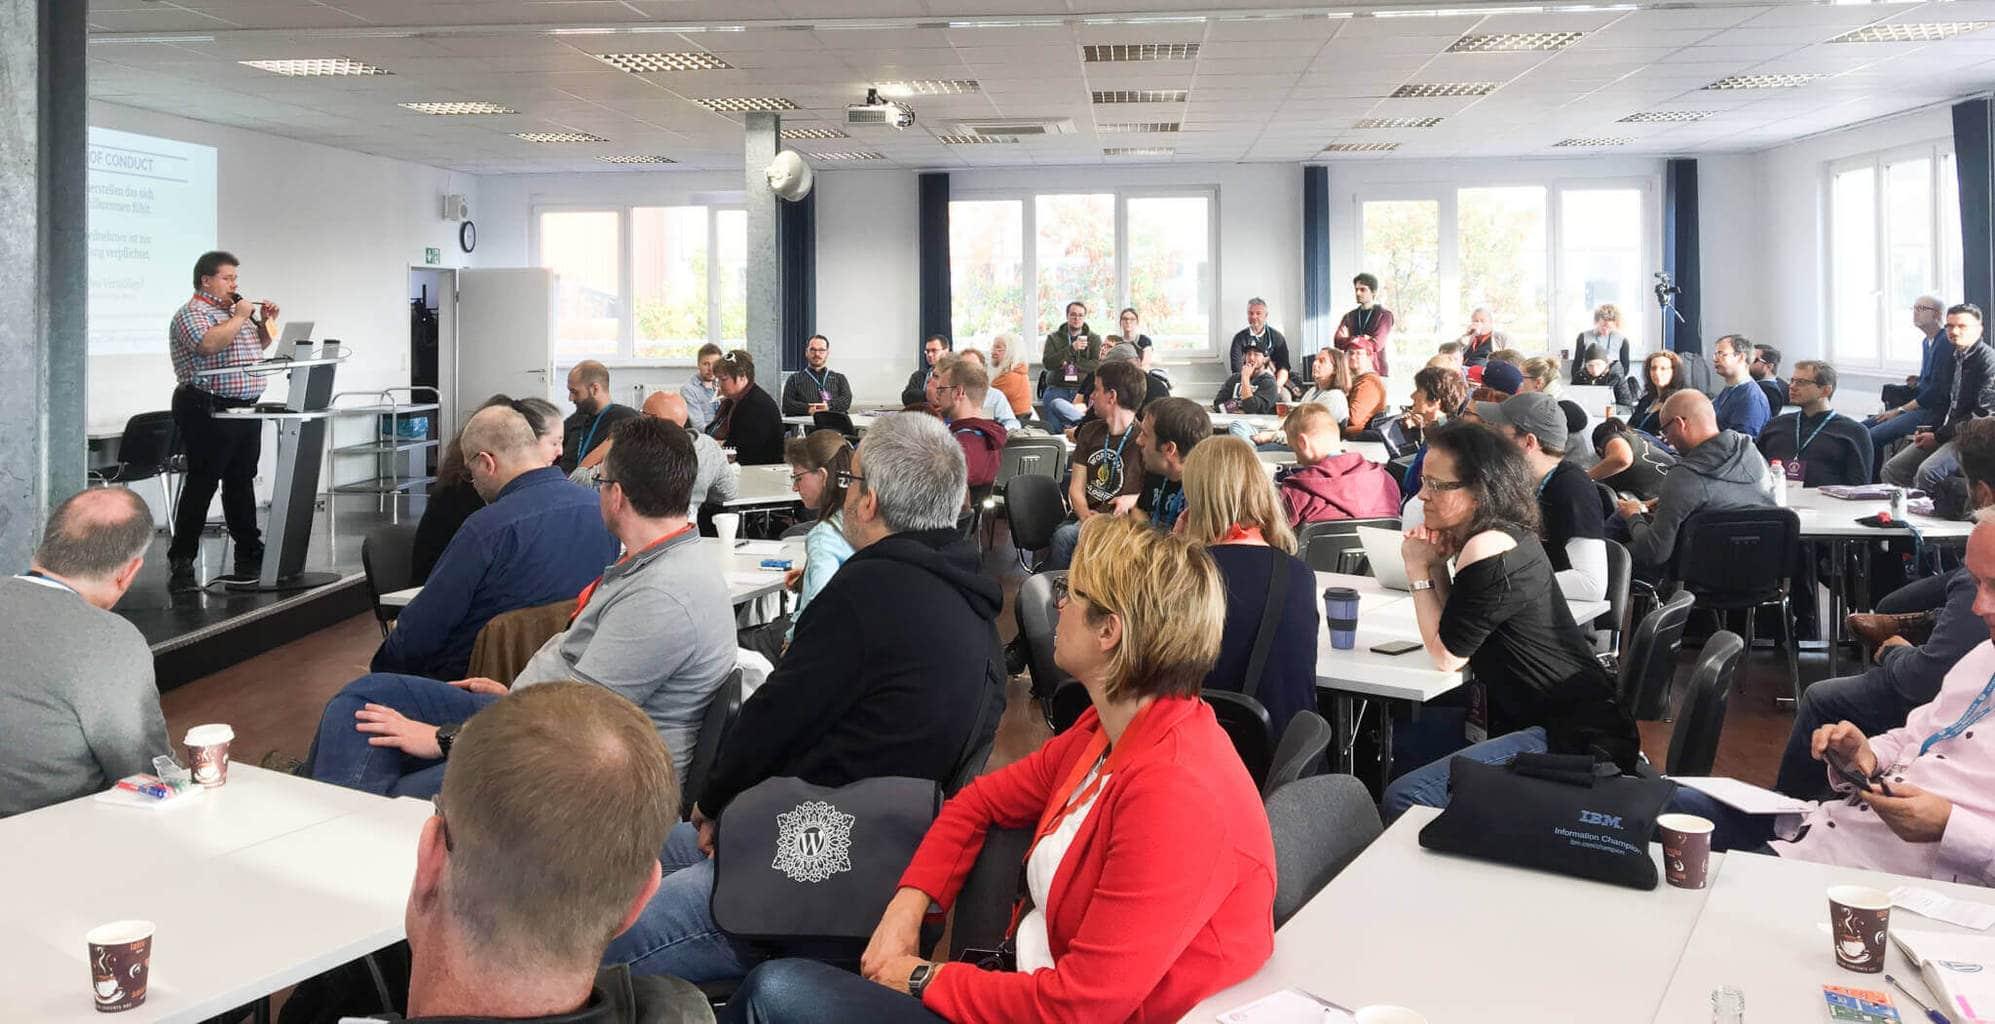 WordCamp Köln Begrüßung